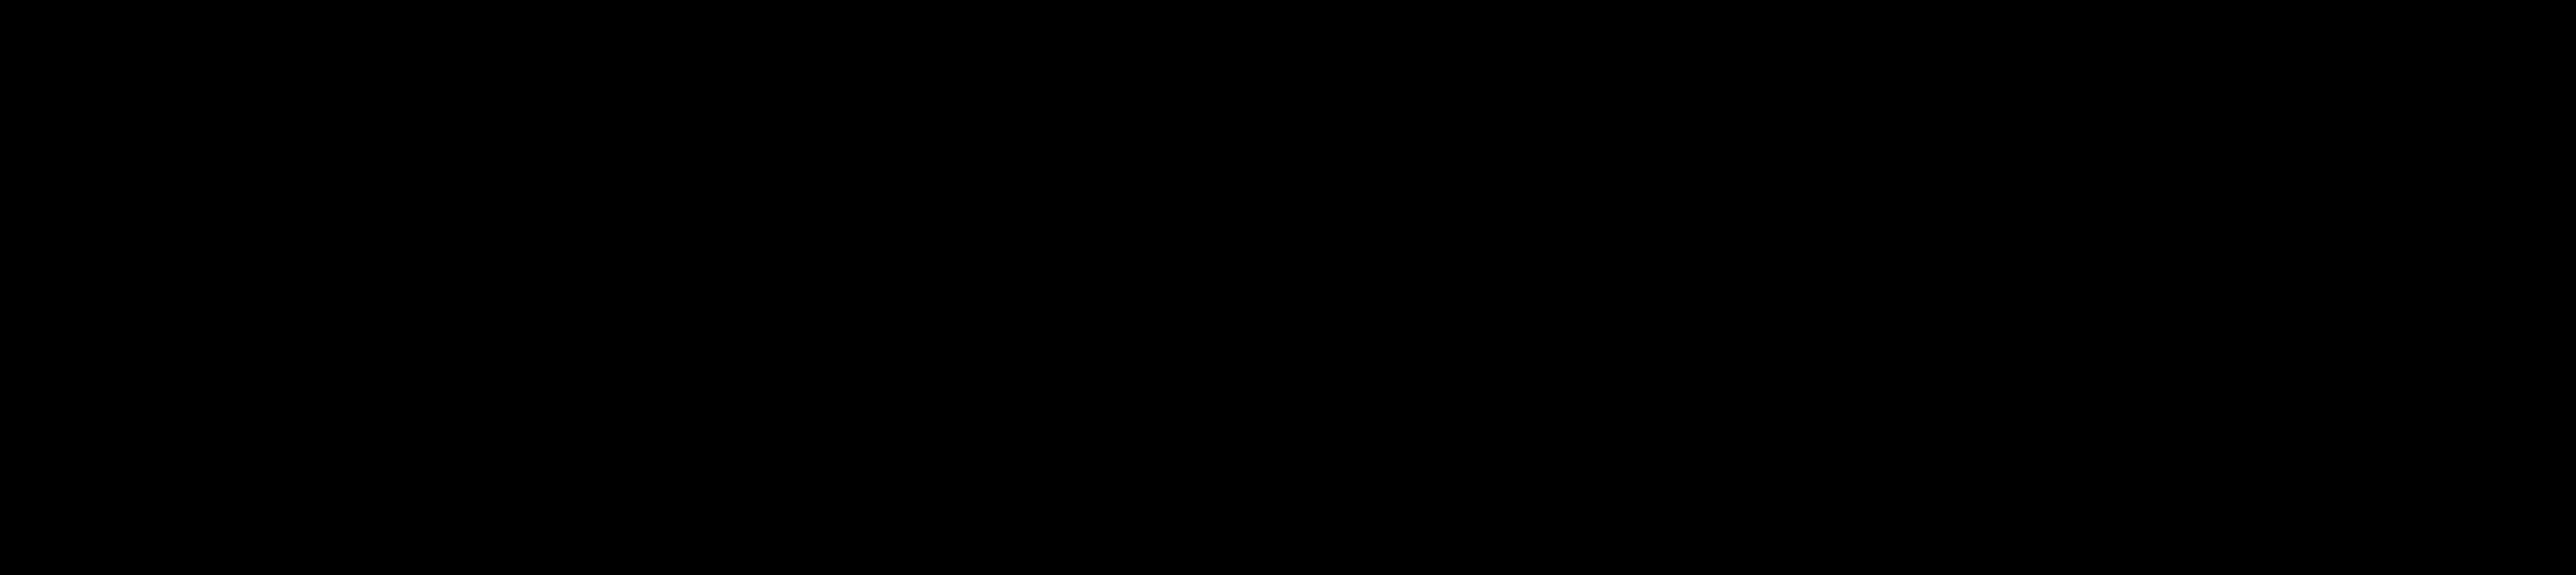 Logo G. La Roche NetB